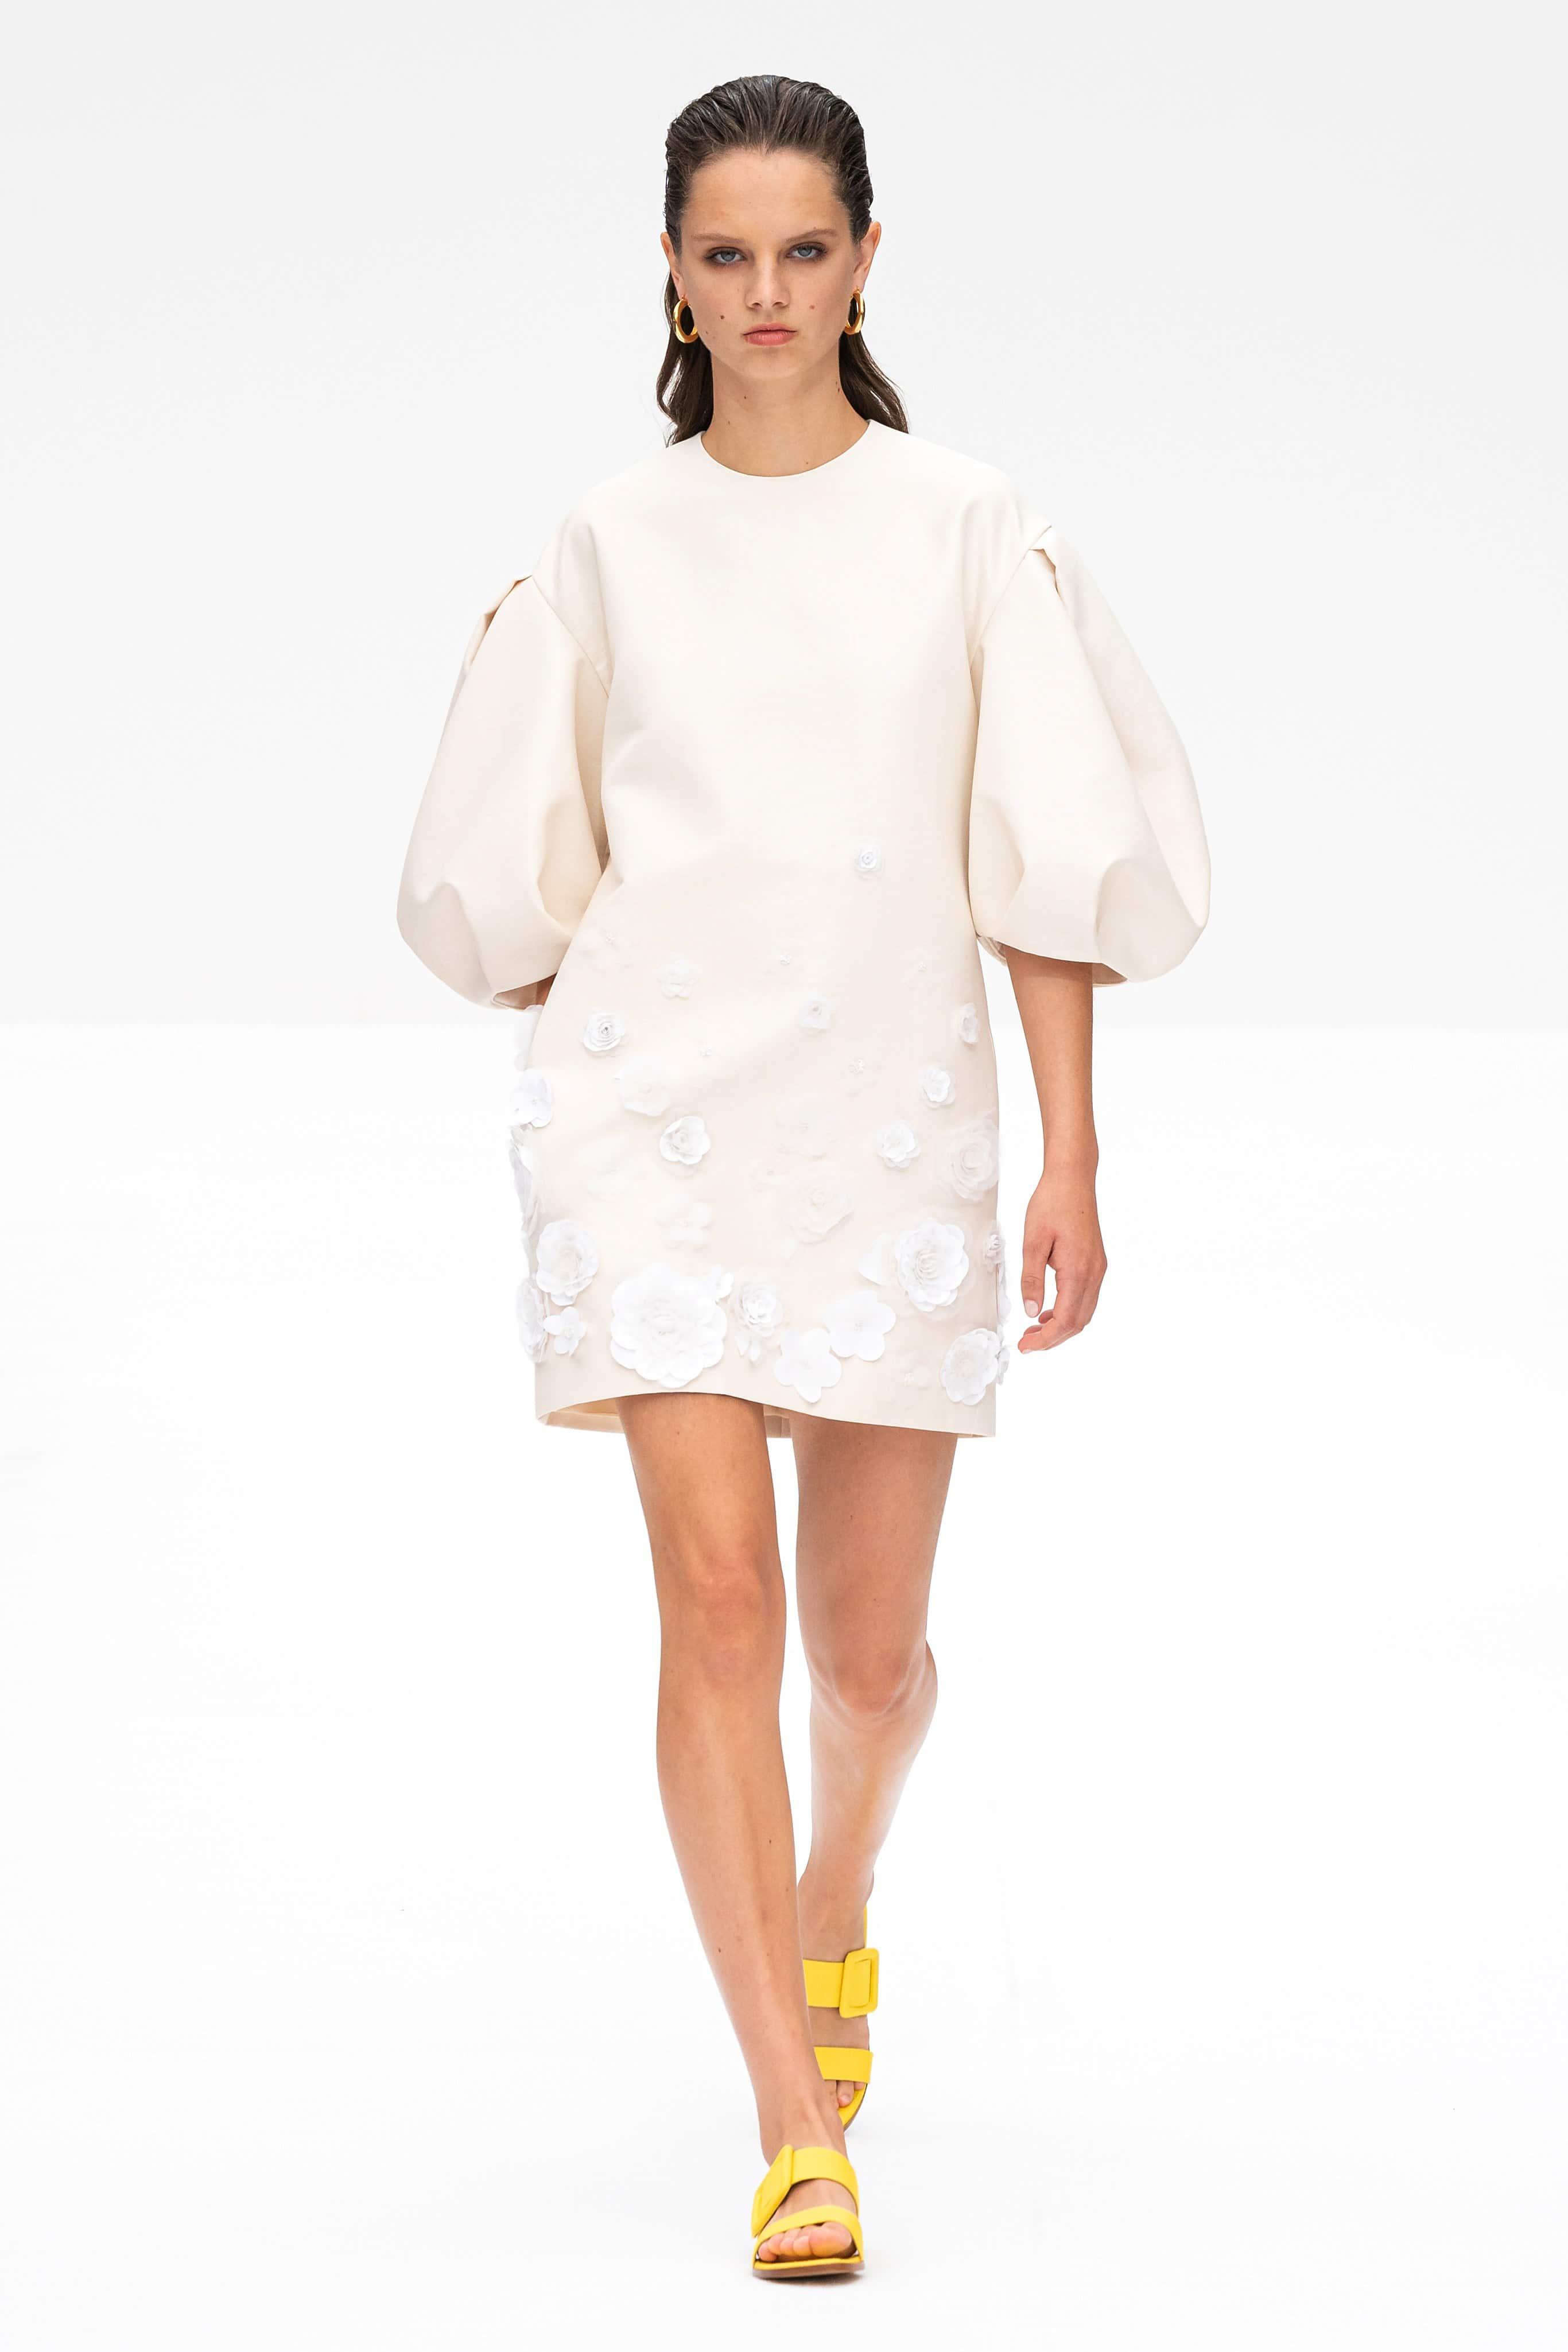 Carolina-Herrera-7-fashion-trends-that-will-be-huge-in-2020